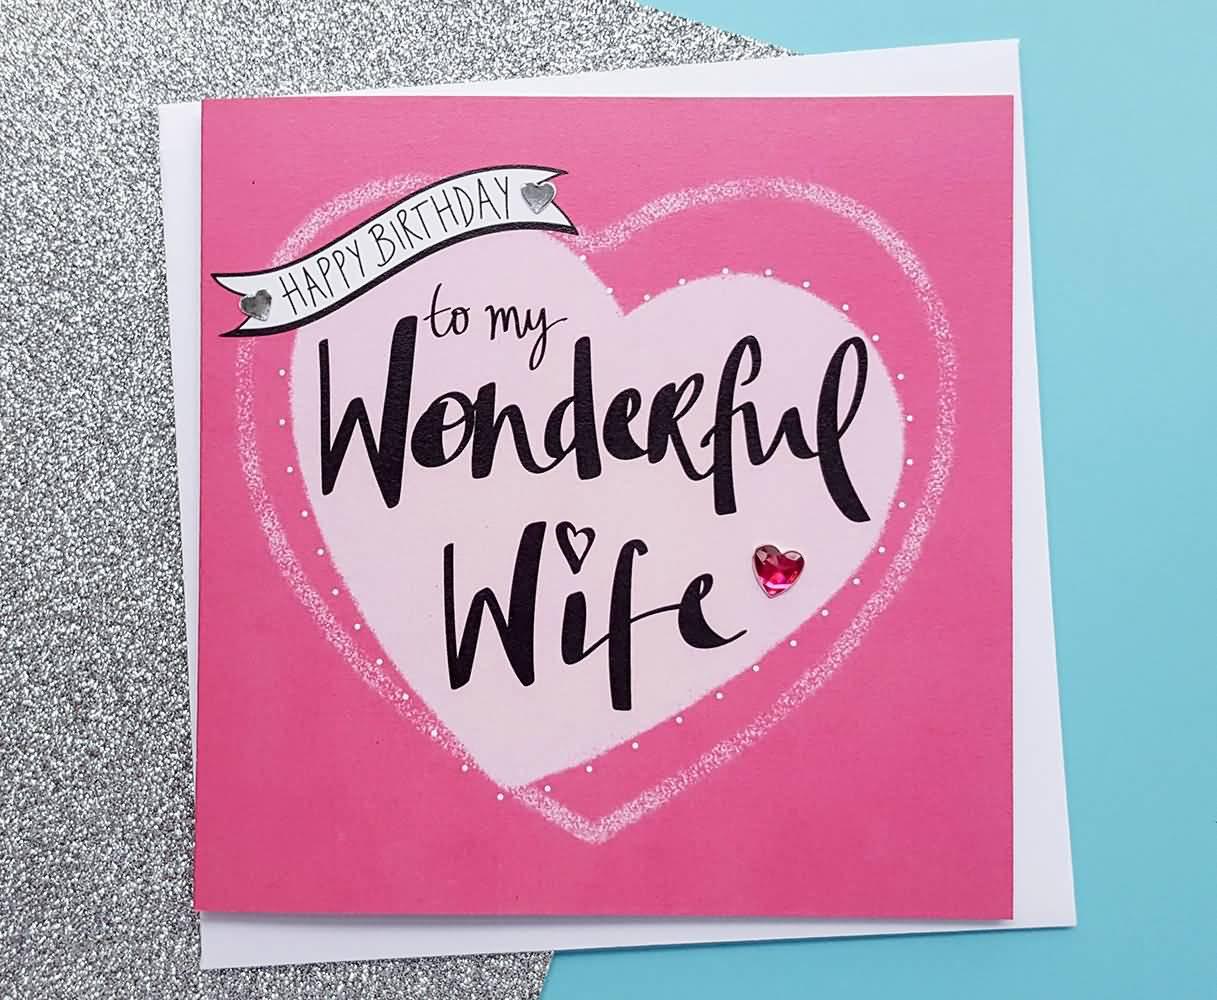 Happy birthday to my wonderful Wife wishes with amazing greetings